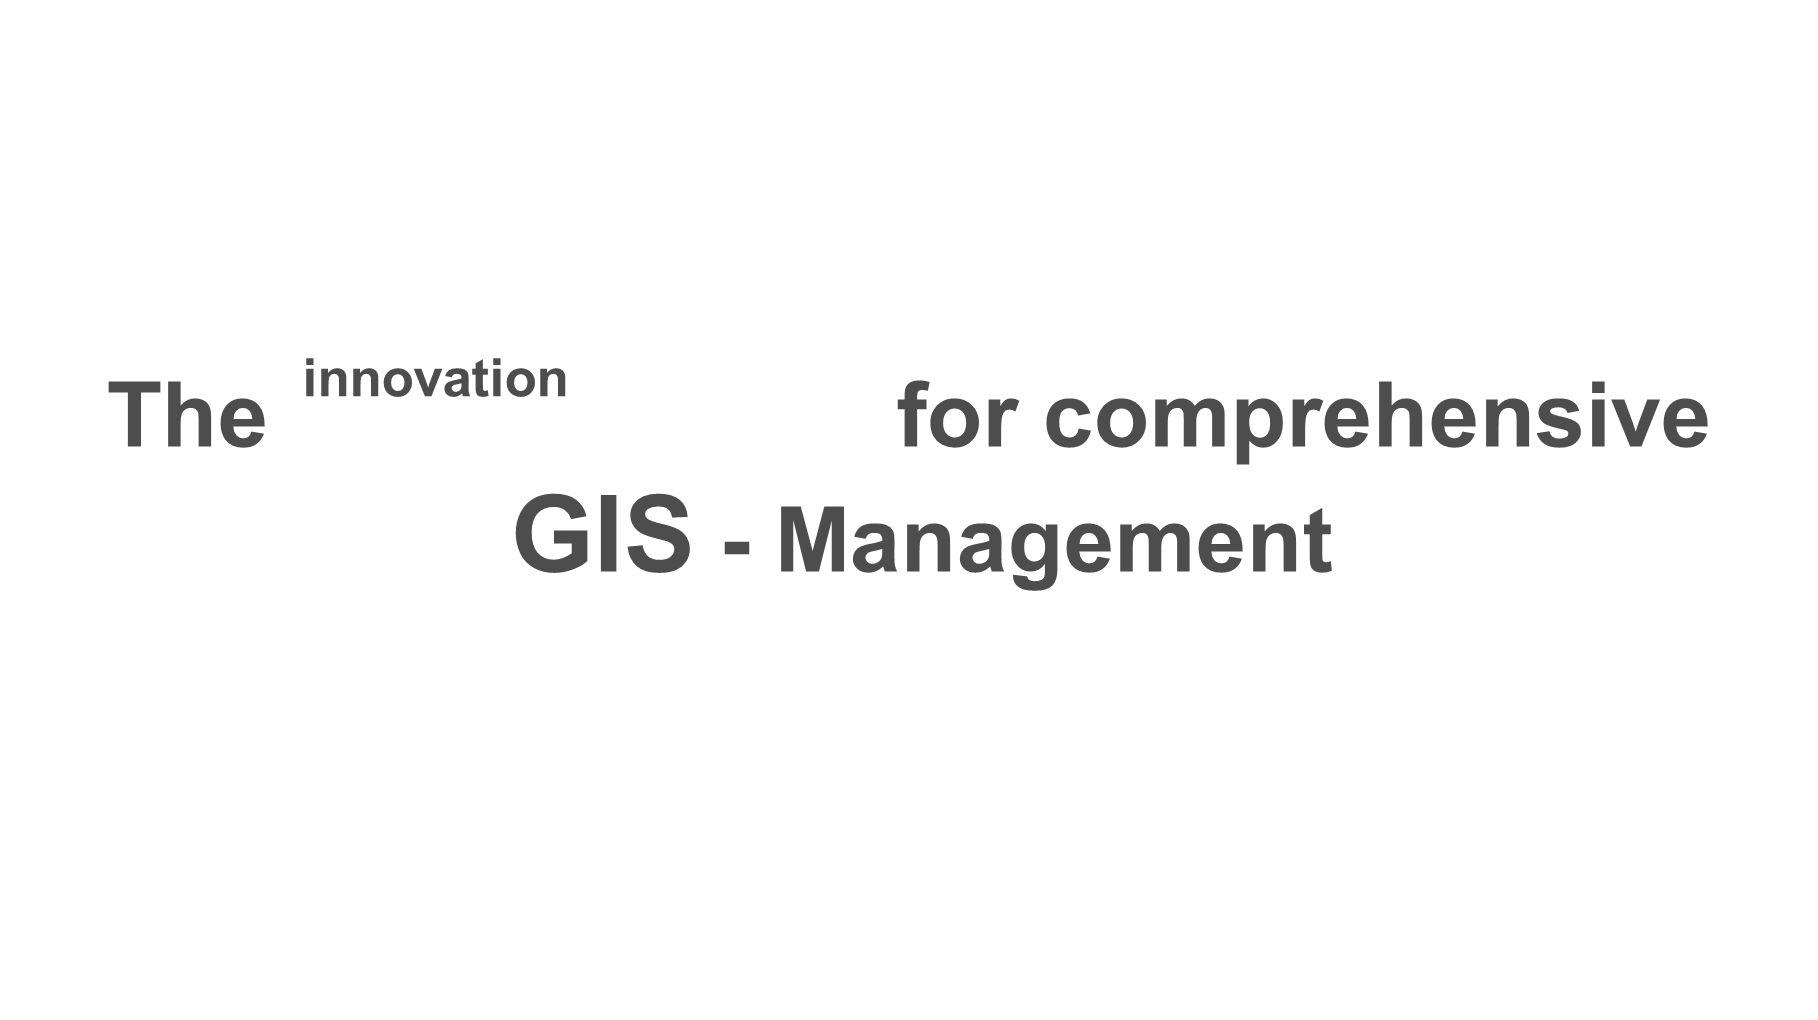 The for comprehensive GIS - Management innovation